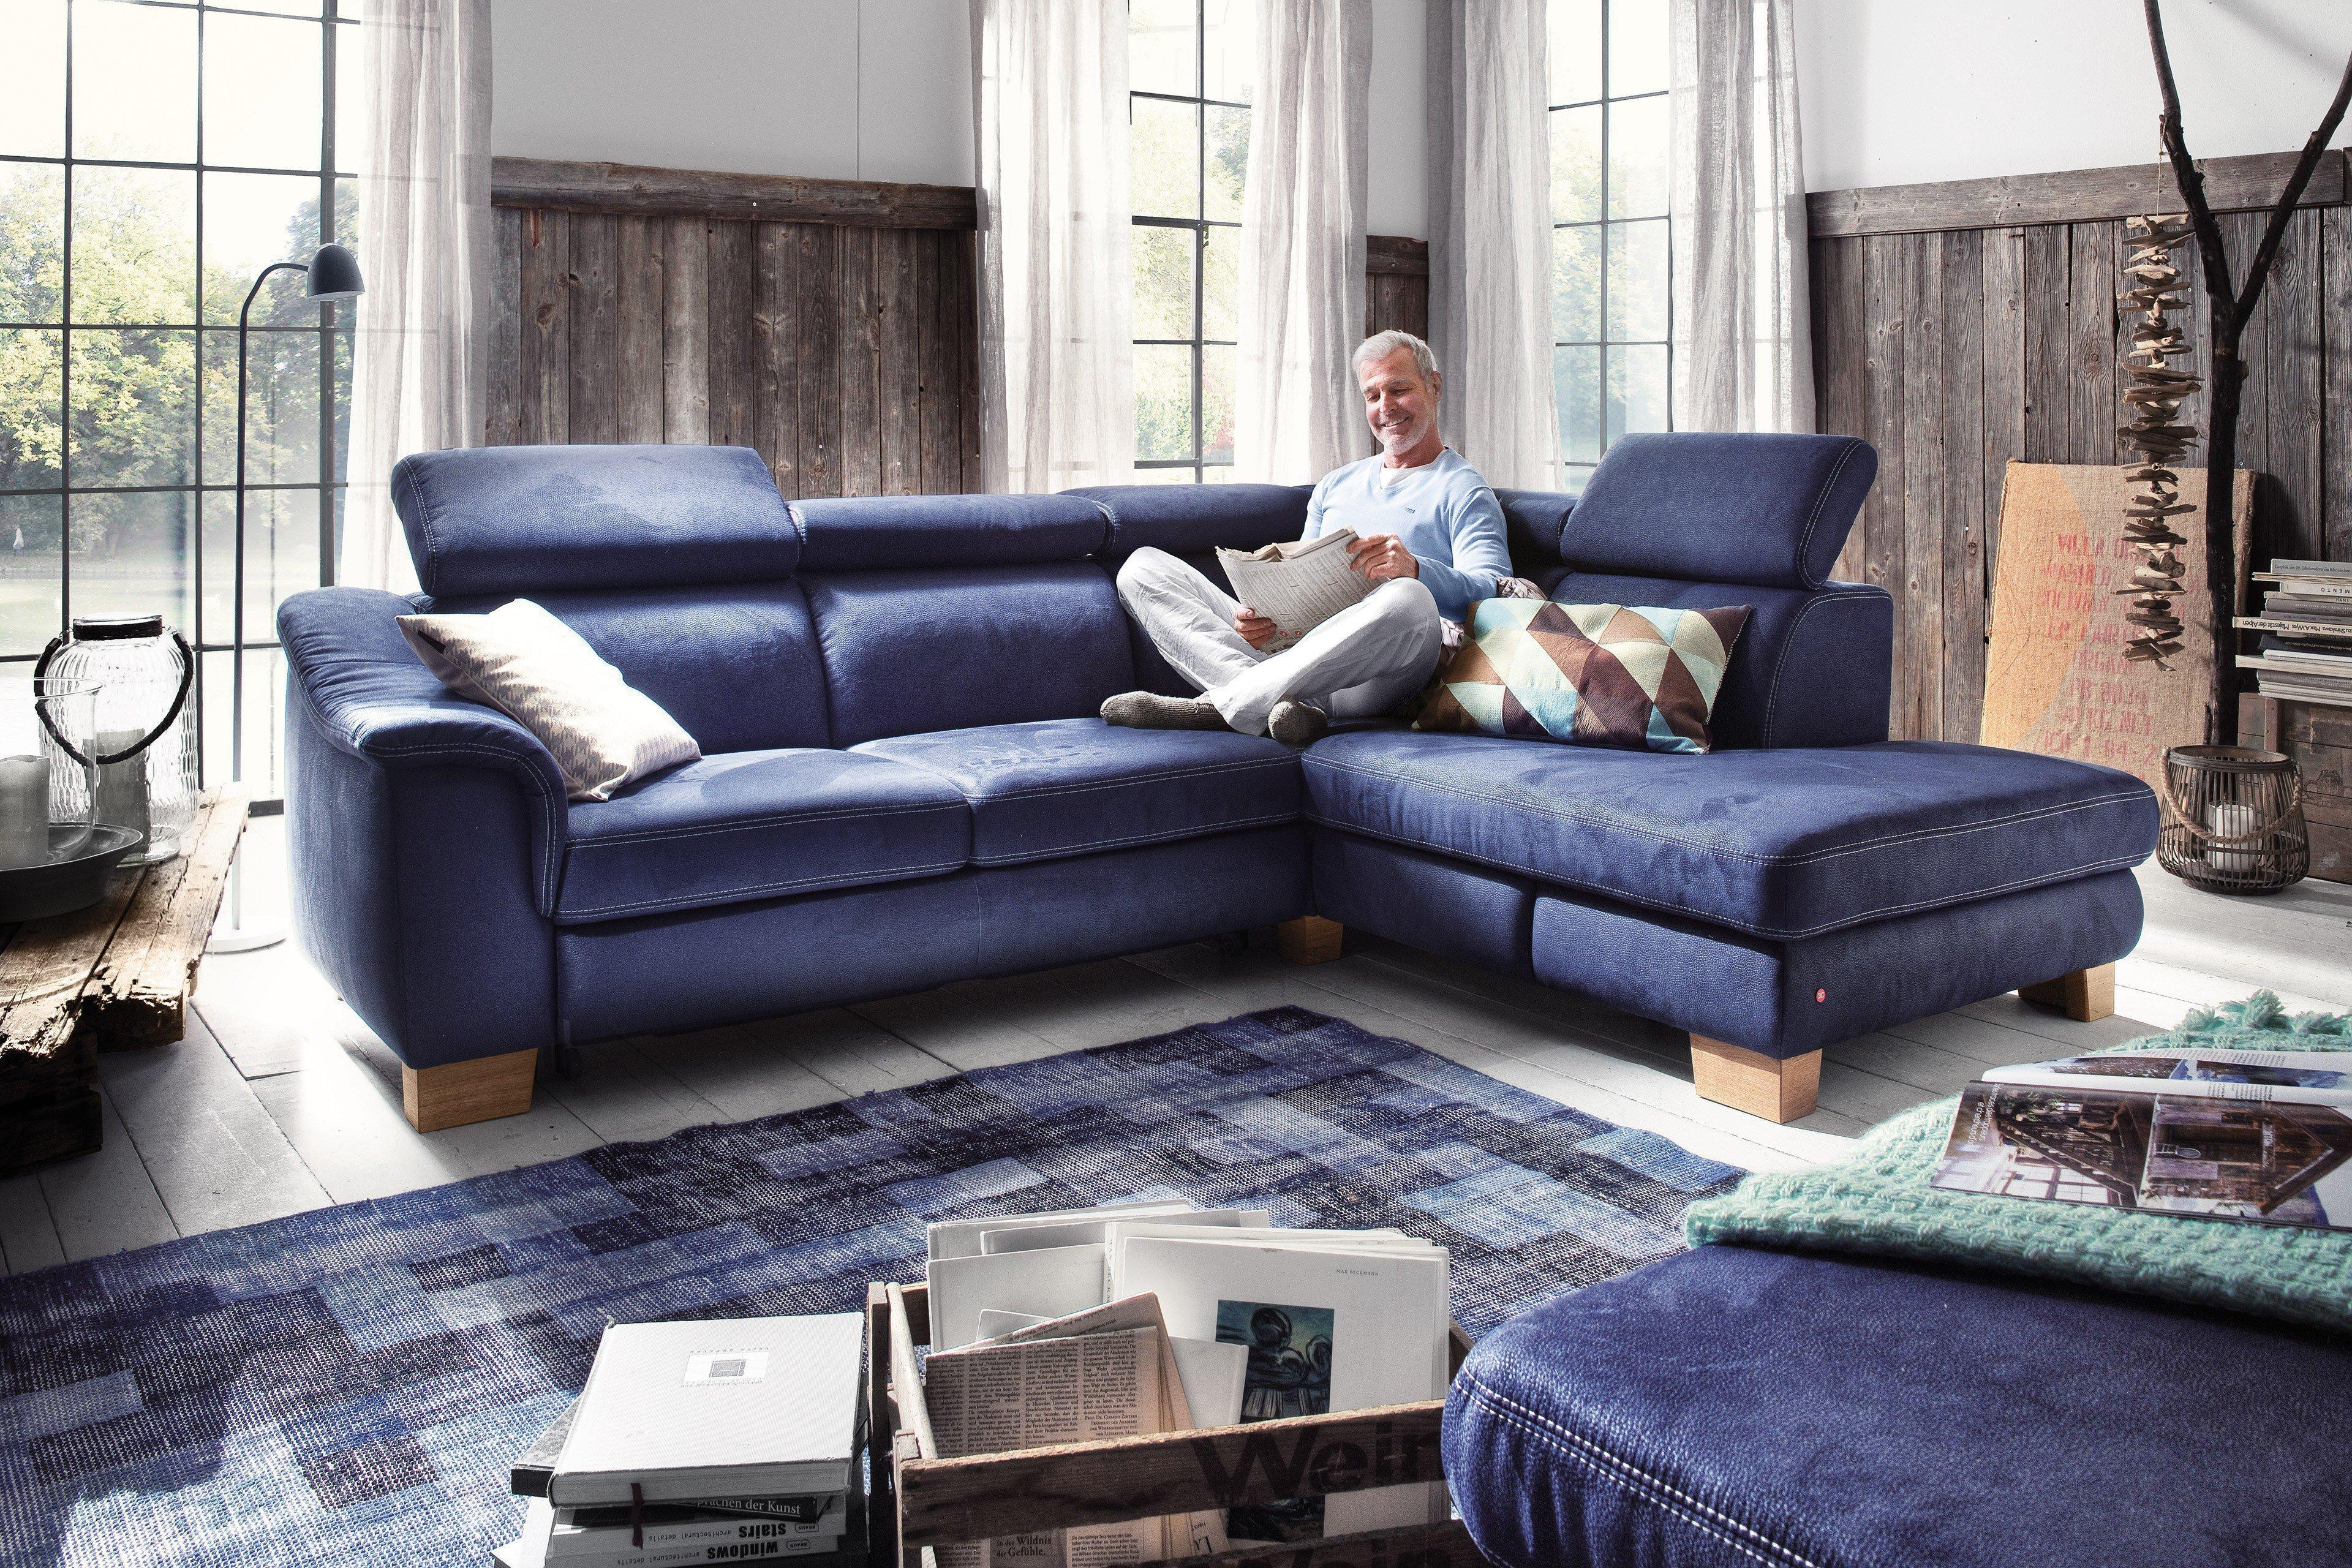 carina polsterm bel heaven ecksofa in blau m bel letz. Black Bedroom Furniture Sets. Home Design Ideas